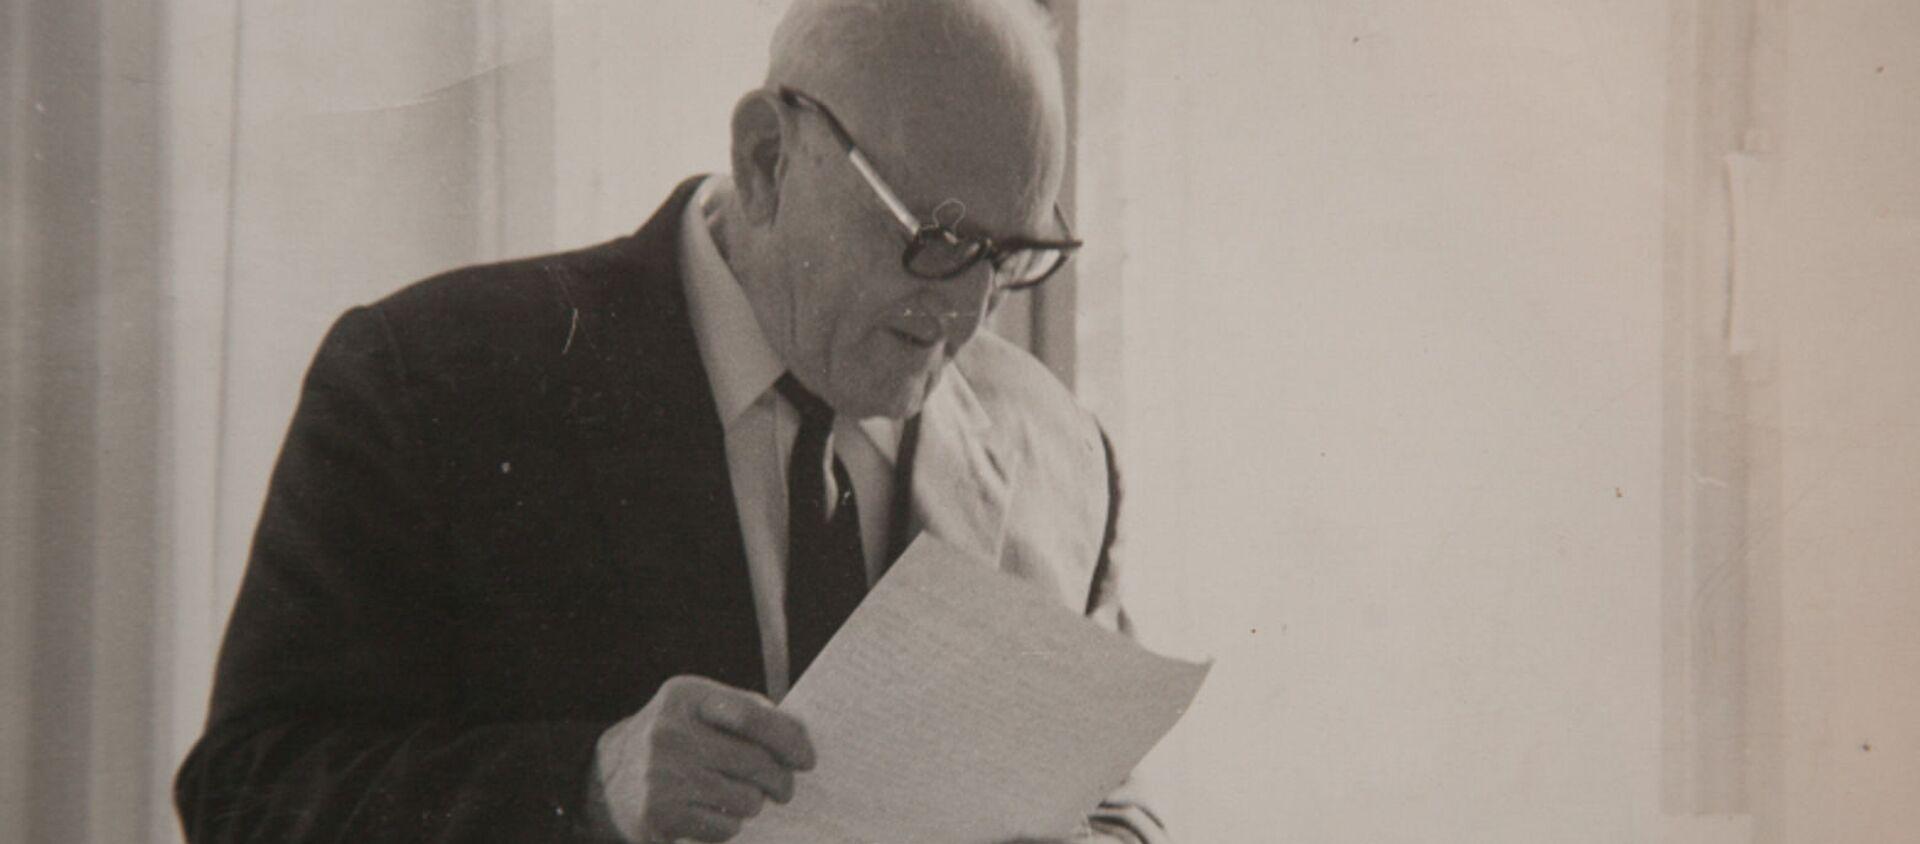 Аԥсуа филологиа апатриарх, абызшәадырҩы Константин Семион-иԥа Шьаҟрыл - Sputnik Аҧсны, 1920, 27.06.2019